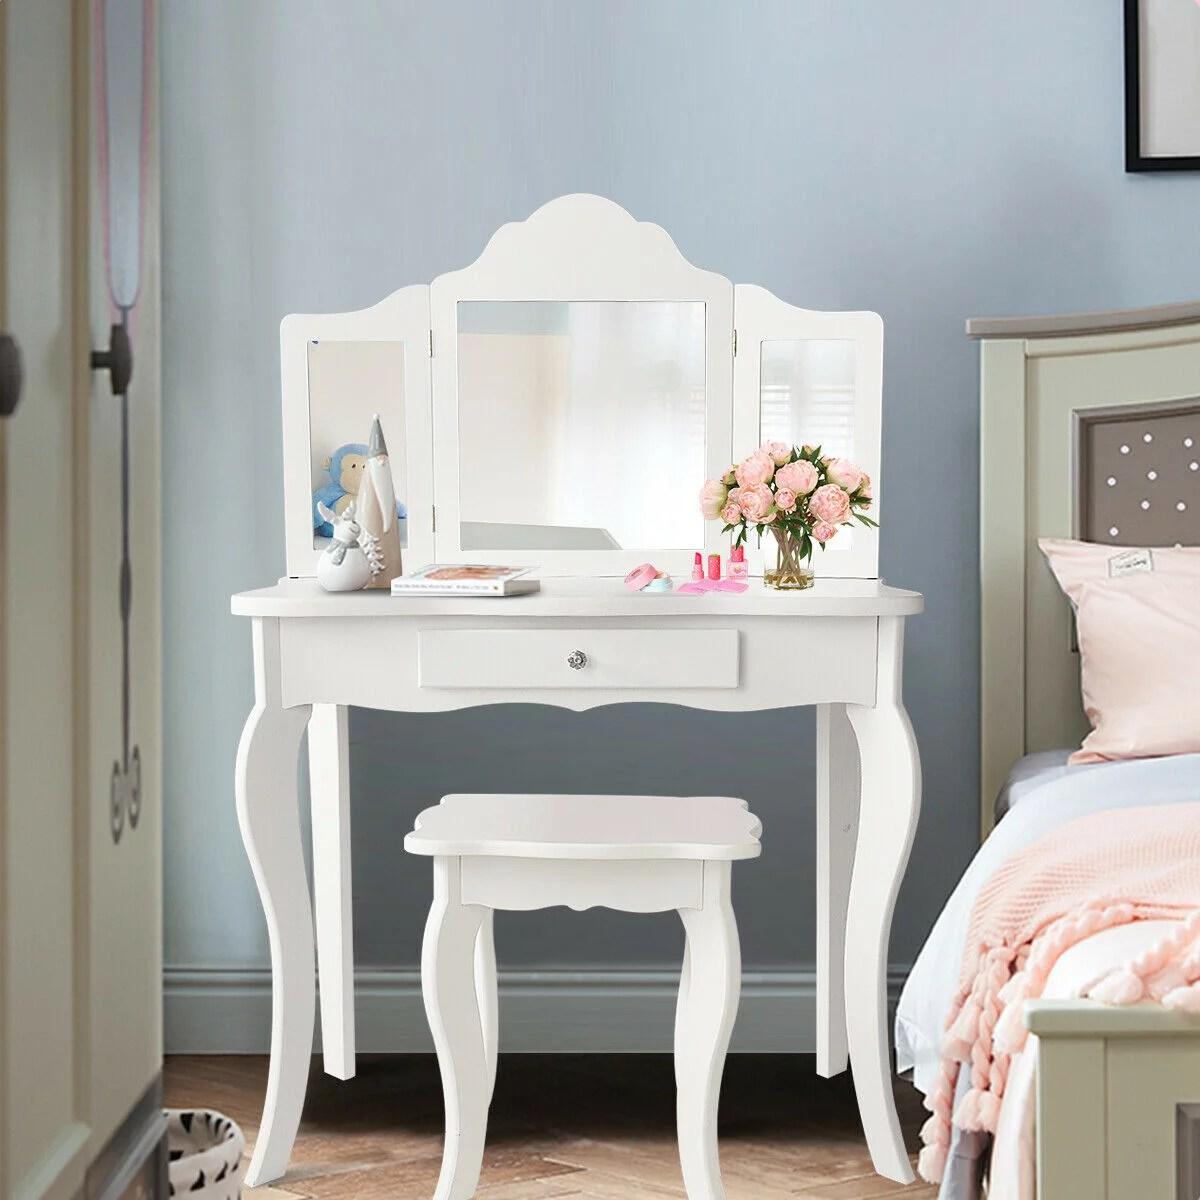 costway vanity table set makeup dressing table kids girls stool mirror walmart com